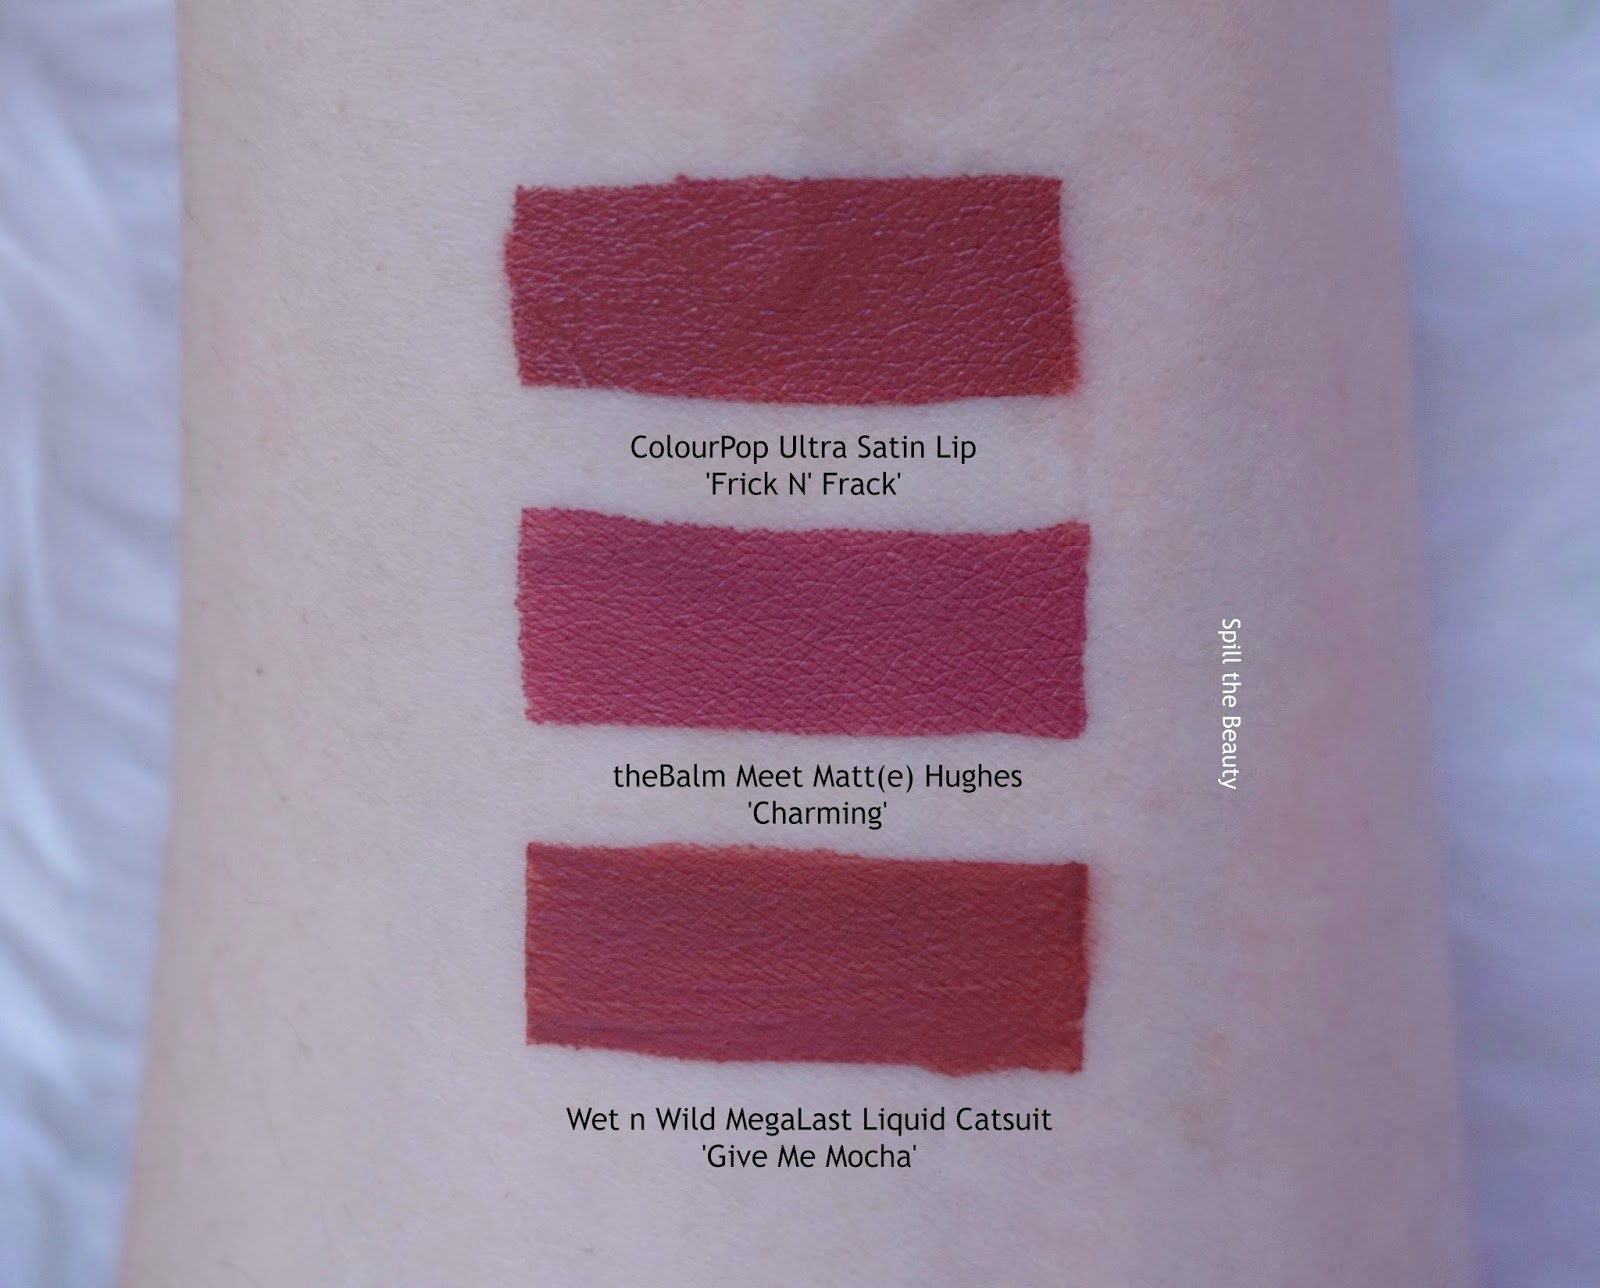 thebalm meet matte hughes long lasting liquid lipstick charming swatches comparison dupe colourpop wet n wild